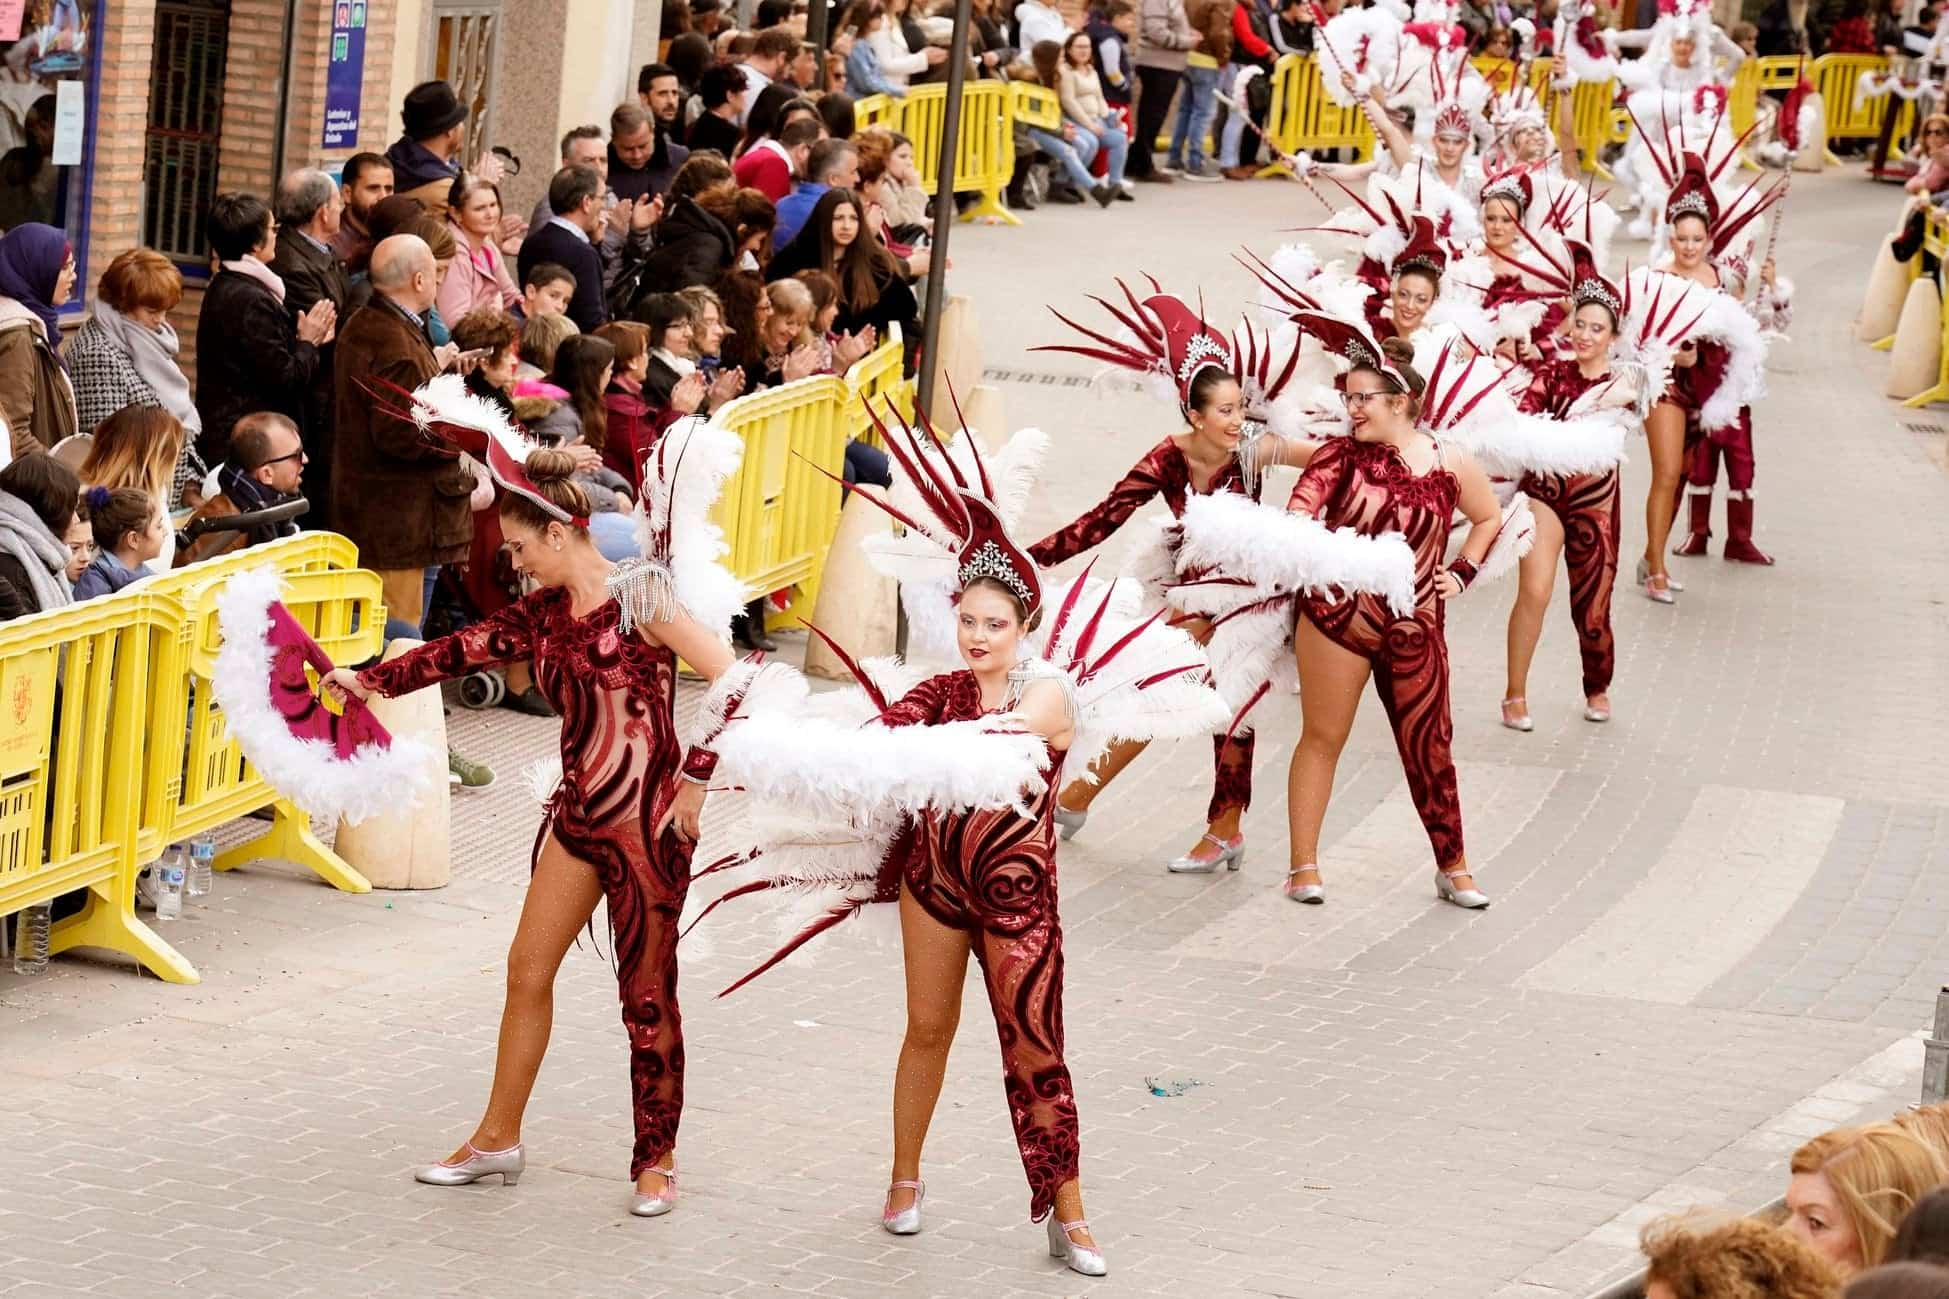 Carnaval de herencia 2020 ofertorio 86 - Selección de fotografías del Ofertorio del Carnaval de Herencia